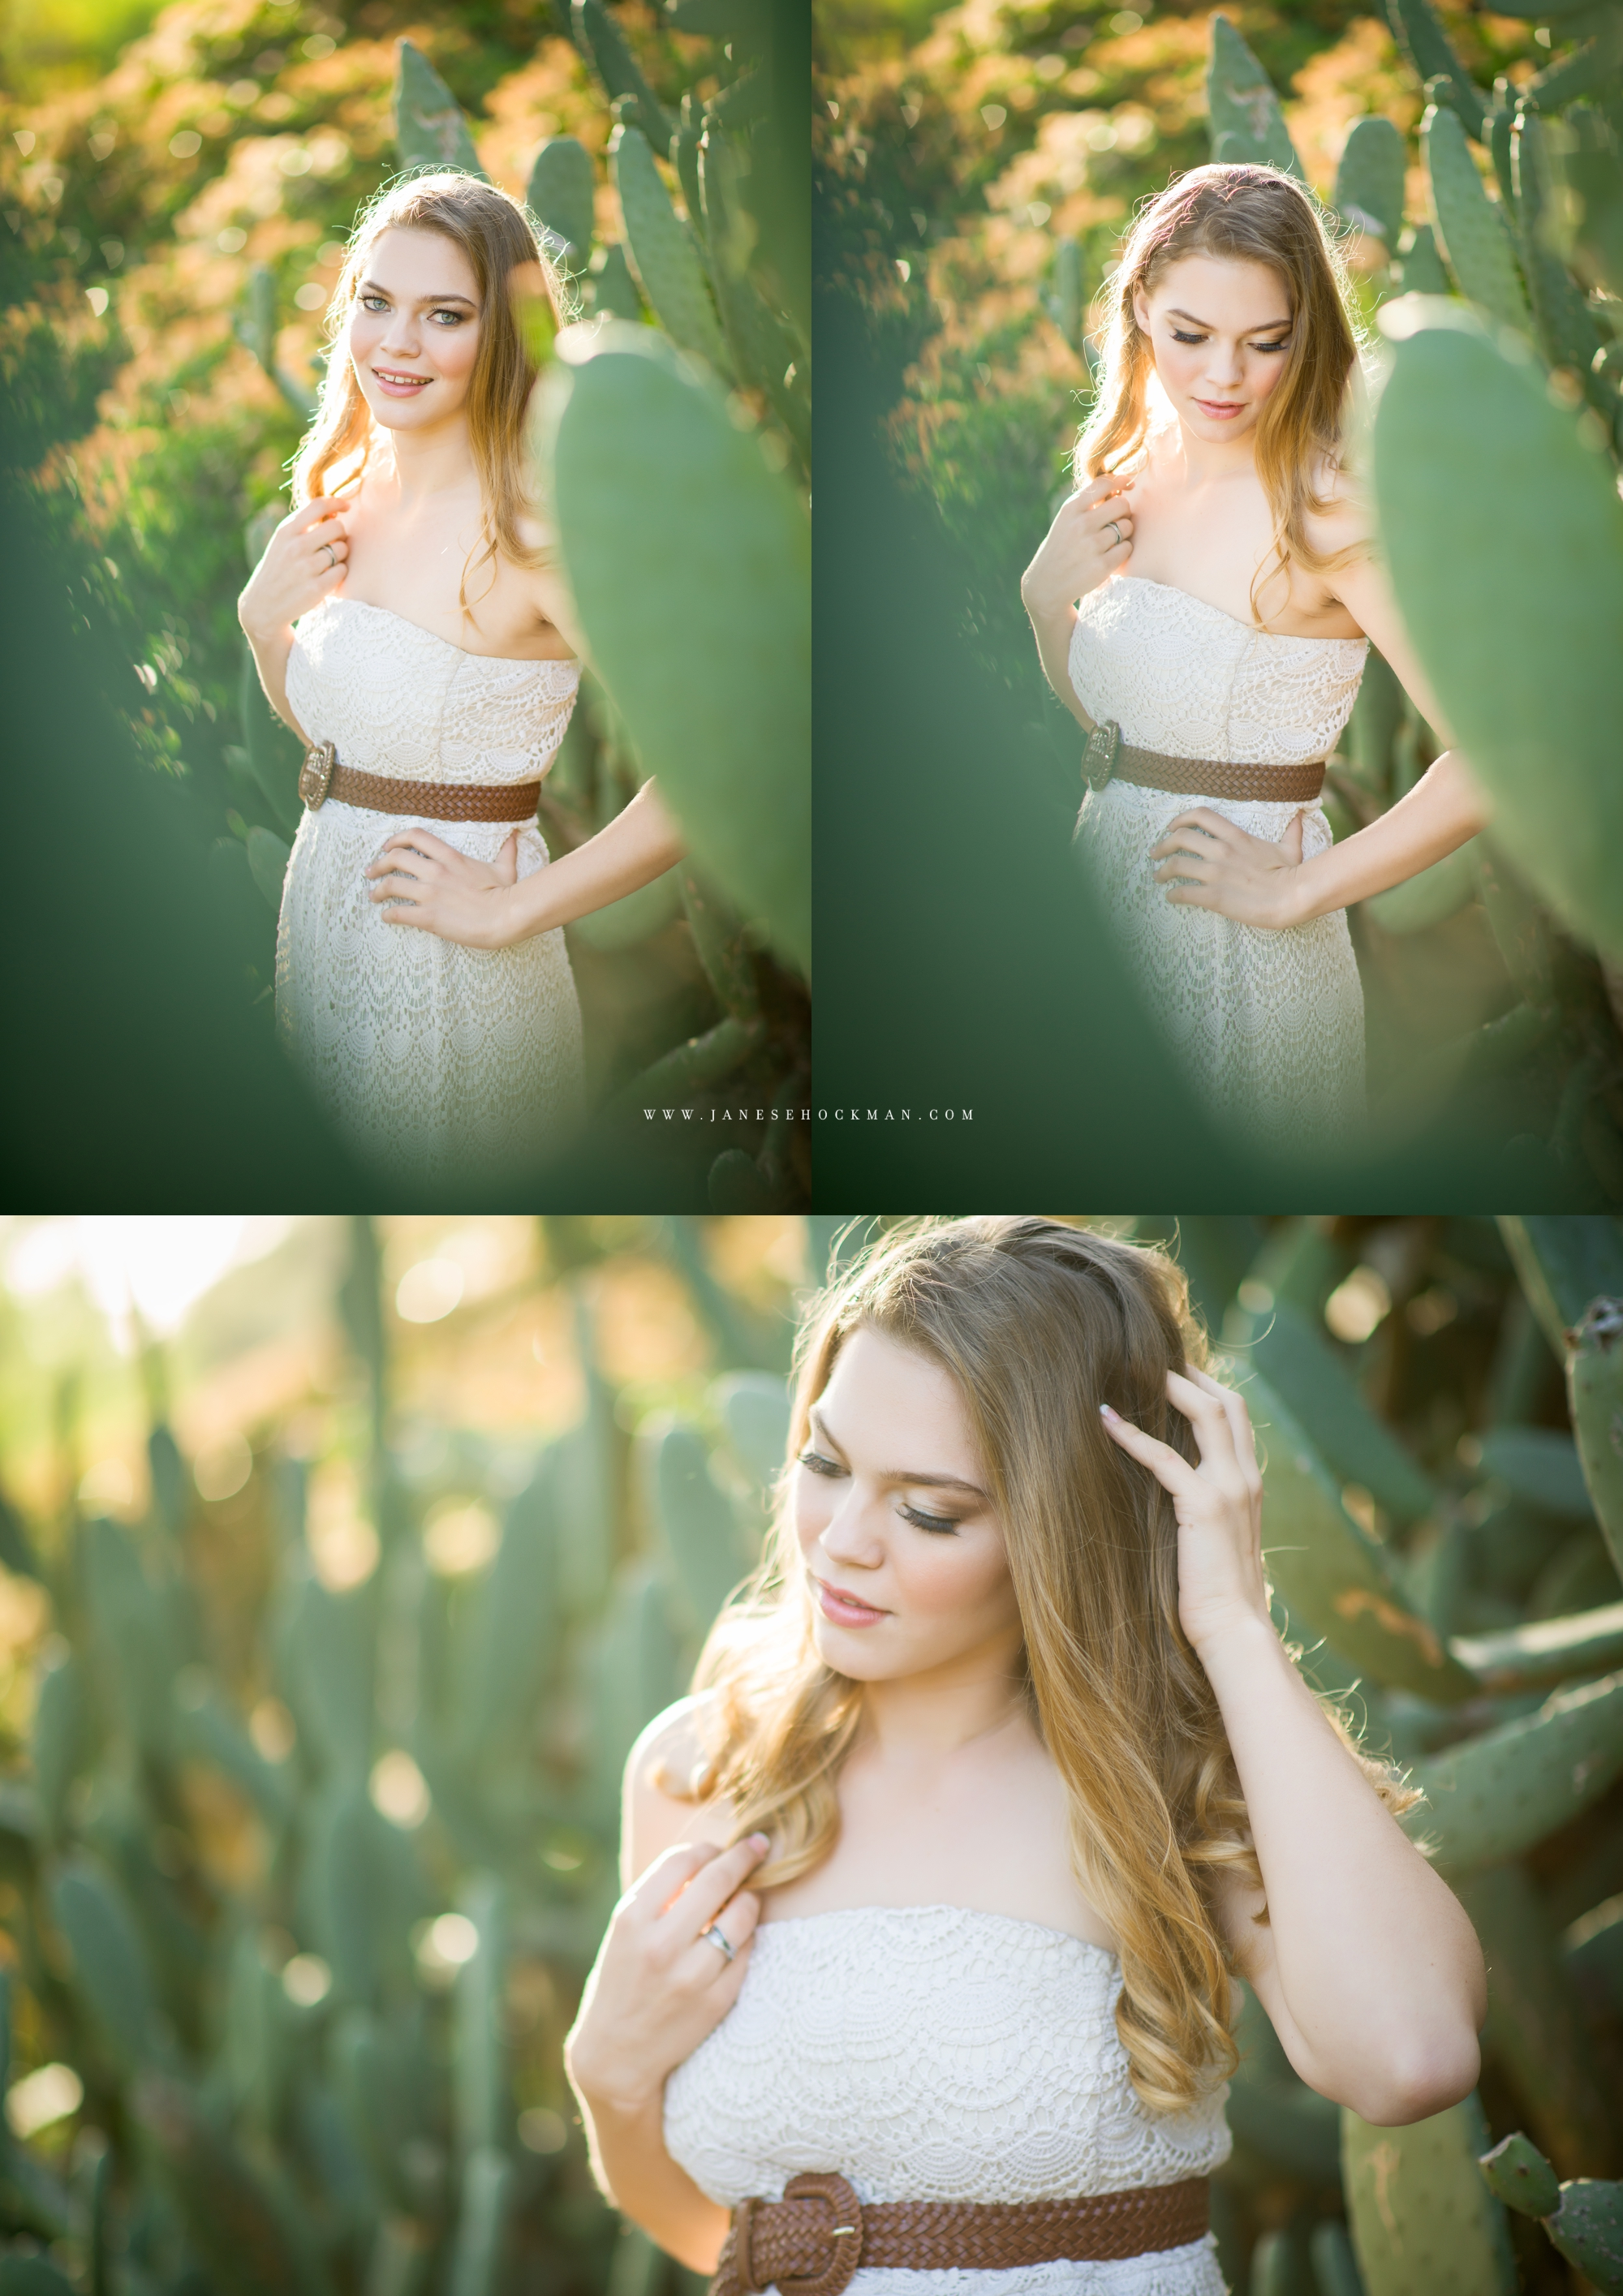 Holly   Janese Hockman Photography   San Luis Obispo, California   High School Senior Portraits   Huntington Beach 7.jpg